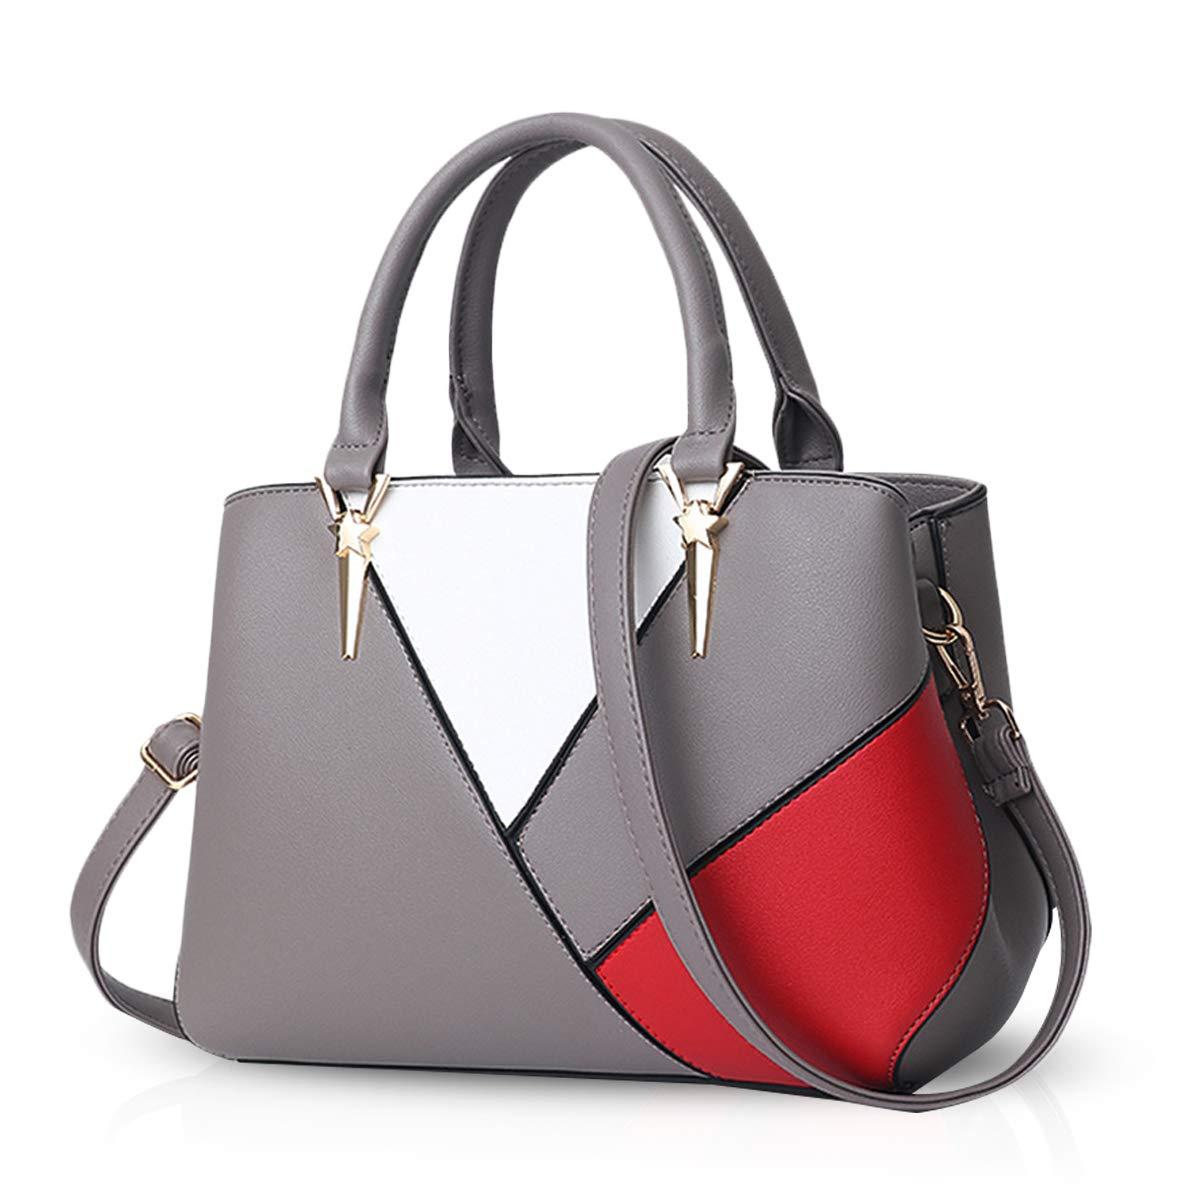 NICOLE /& DORIS Handbags for ladies womens handbag splicing color crossbody bags the latest trends